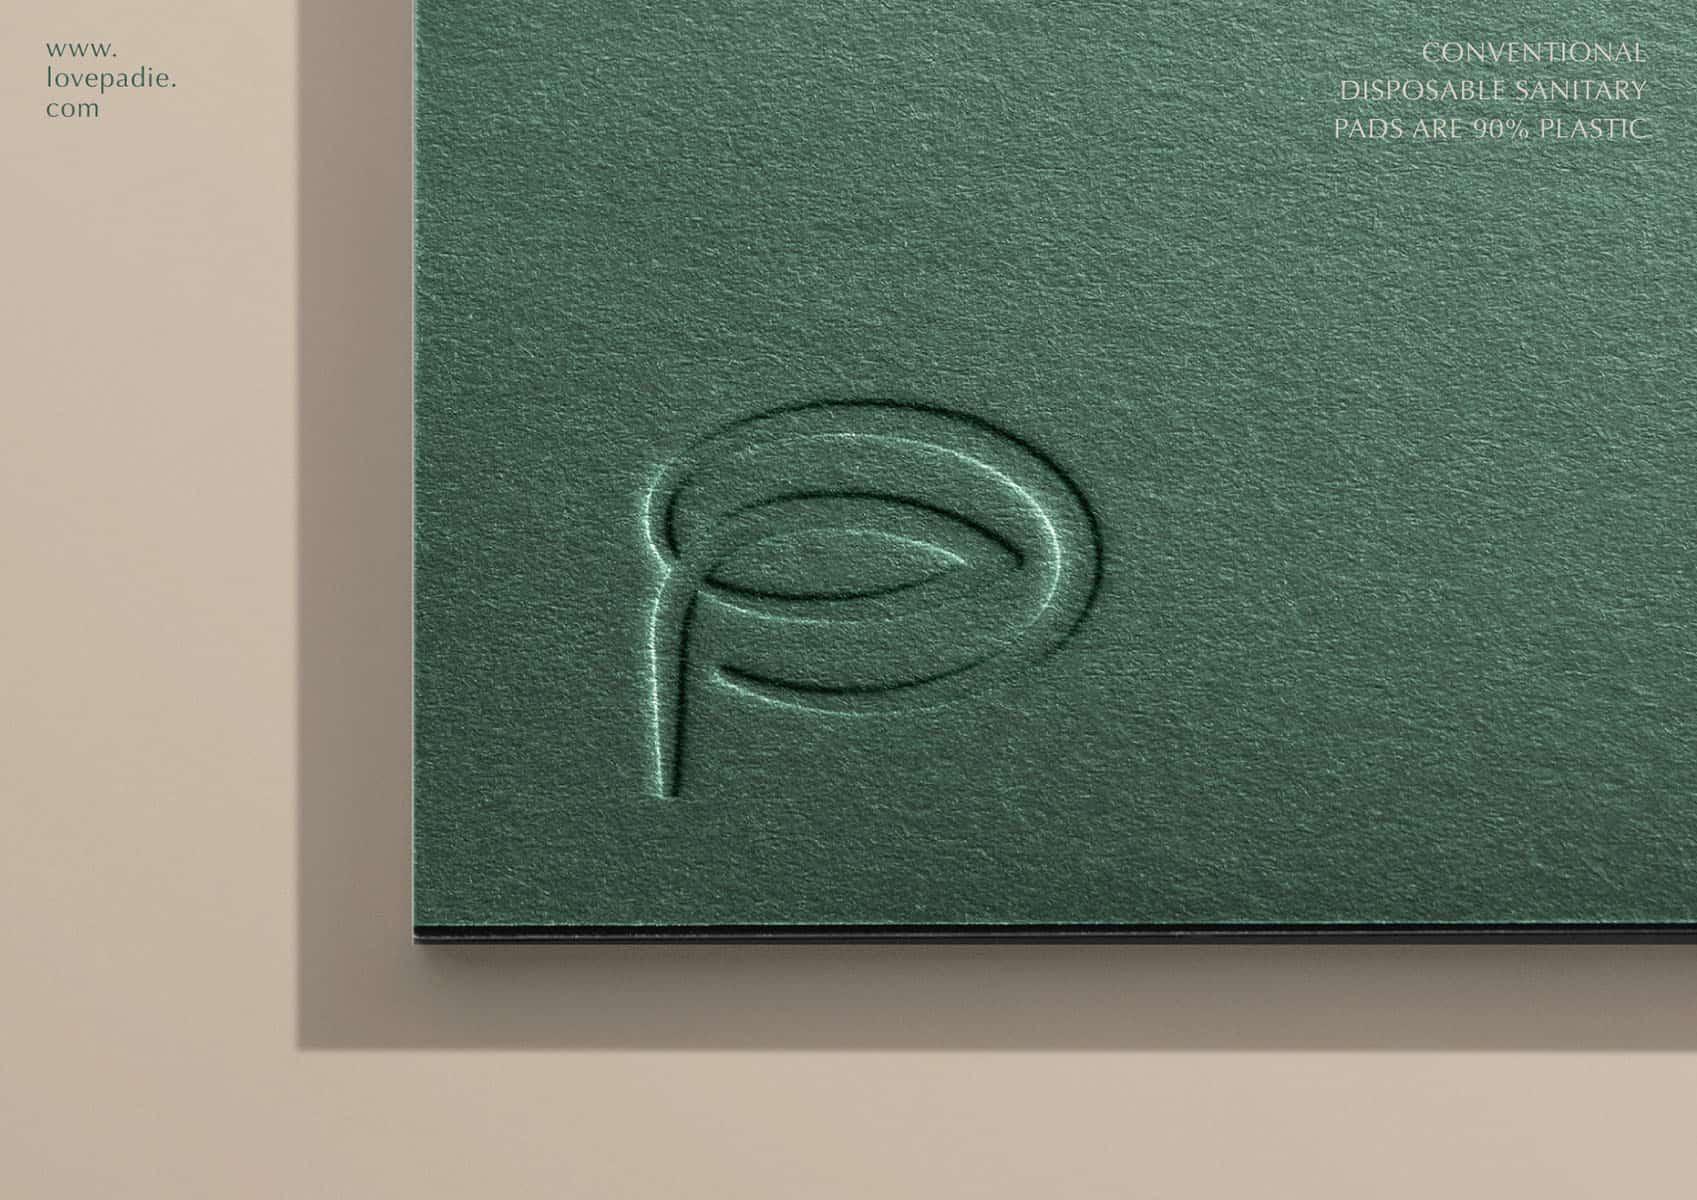 Padie - 可分解衛生巾 | 品牌設計及包裝設計